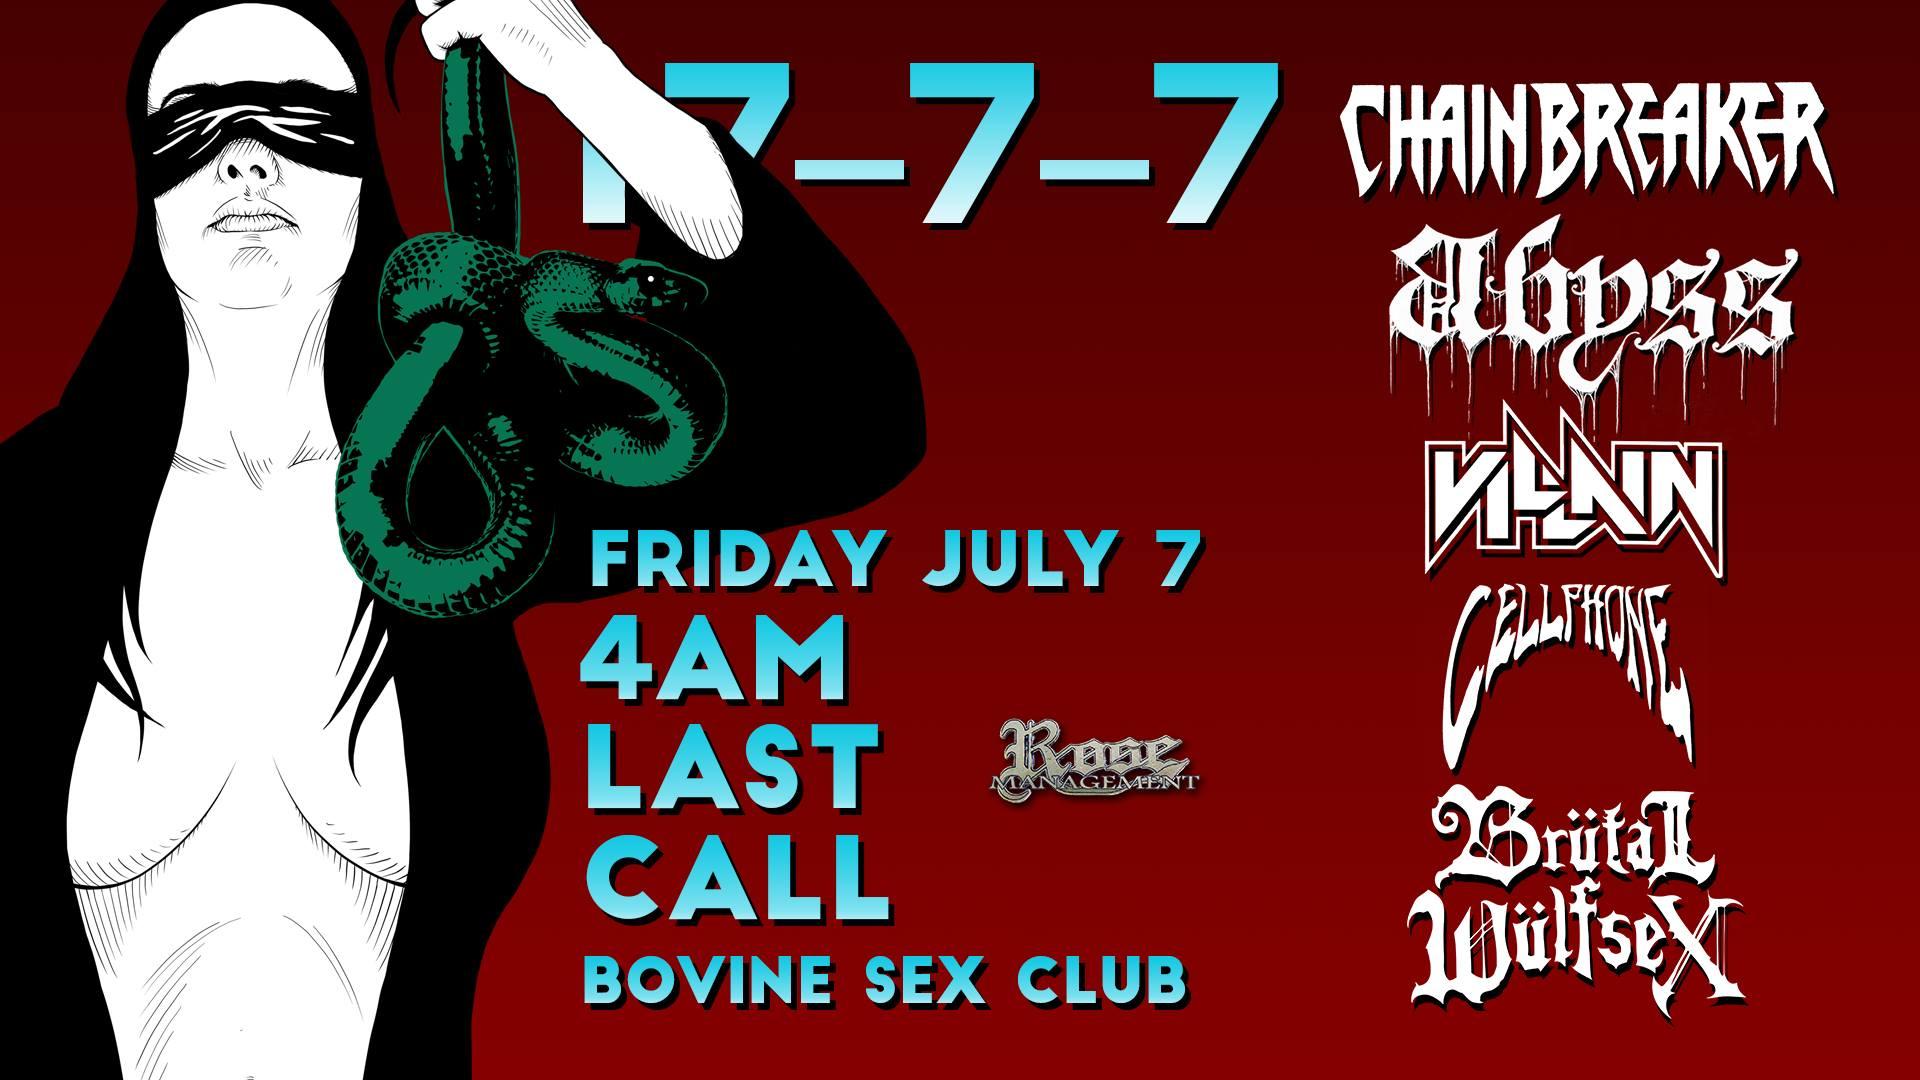 Chainbreaker  *4 am last call*